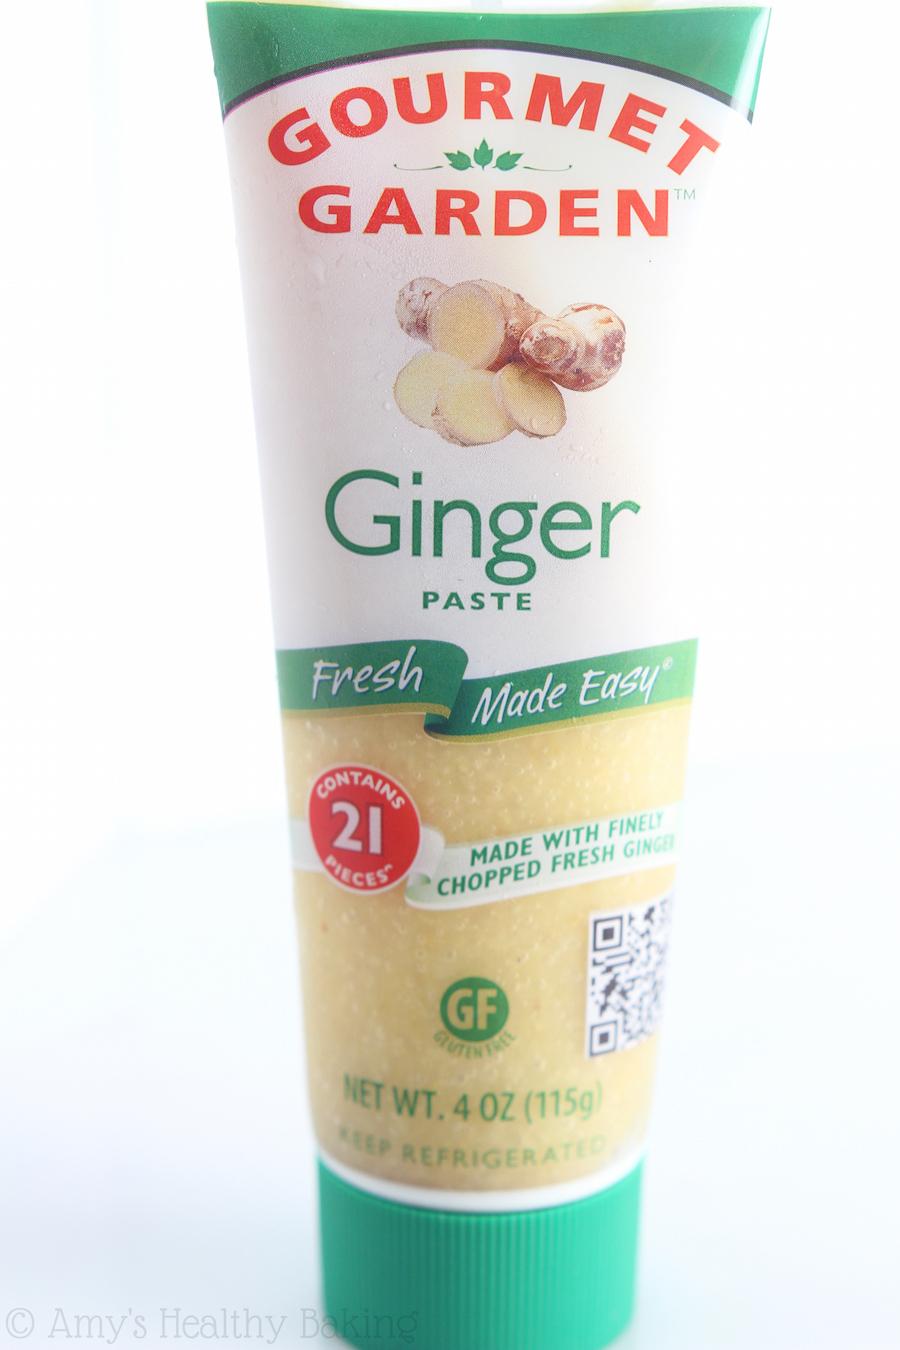 Gourmet Garden Ginger Stir-In Paste